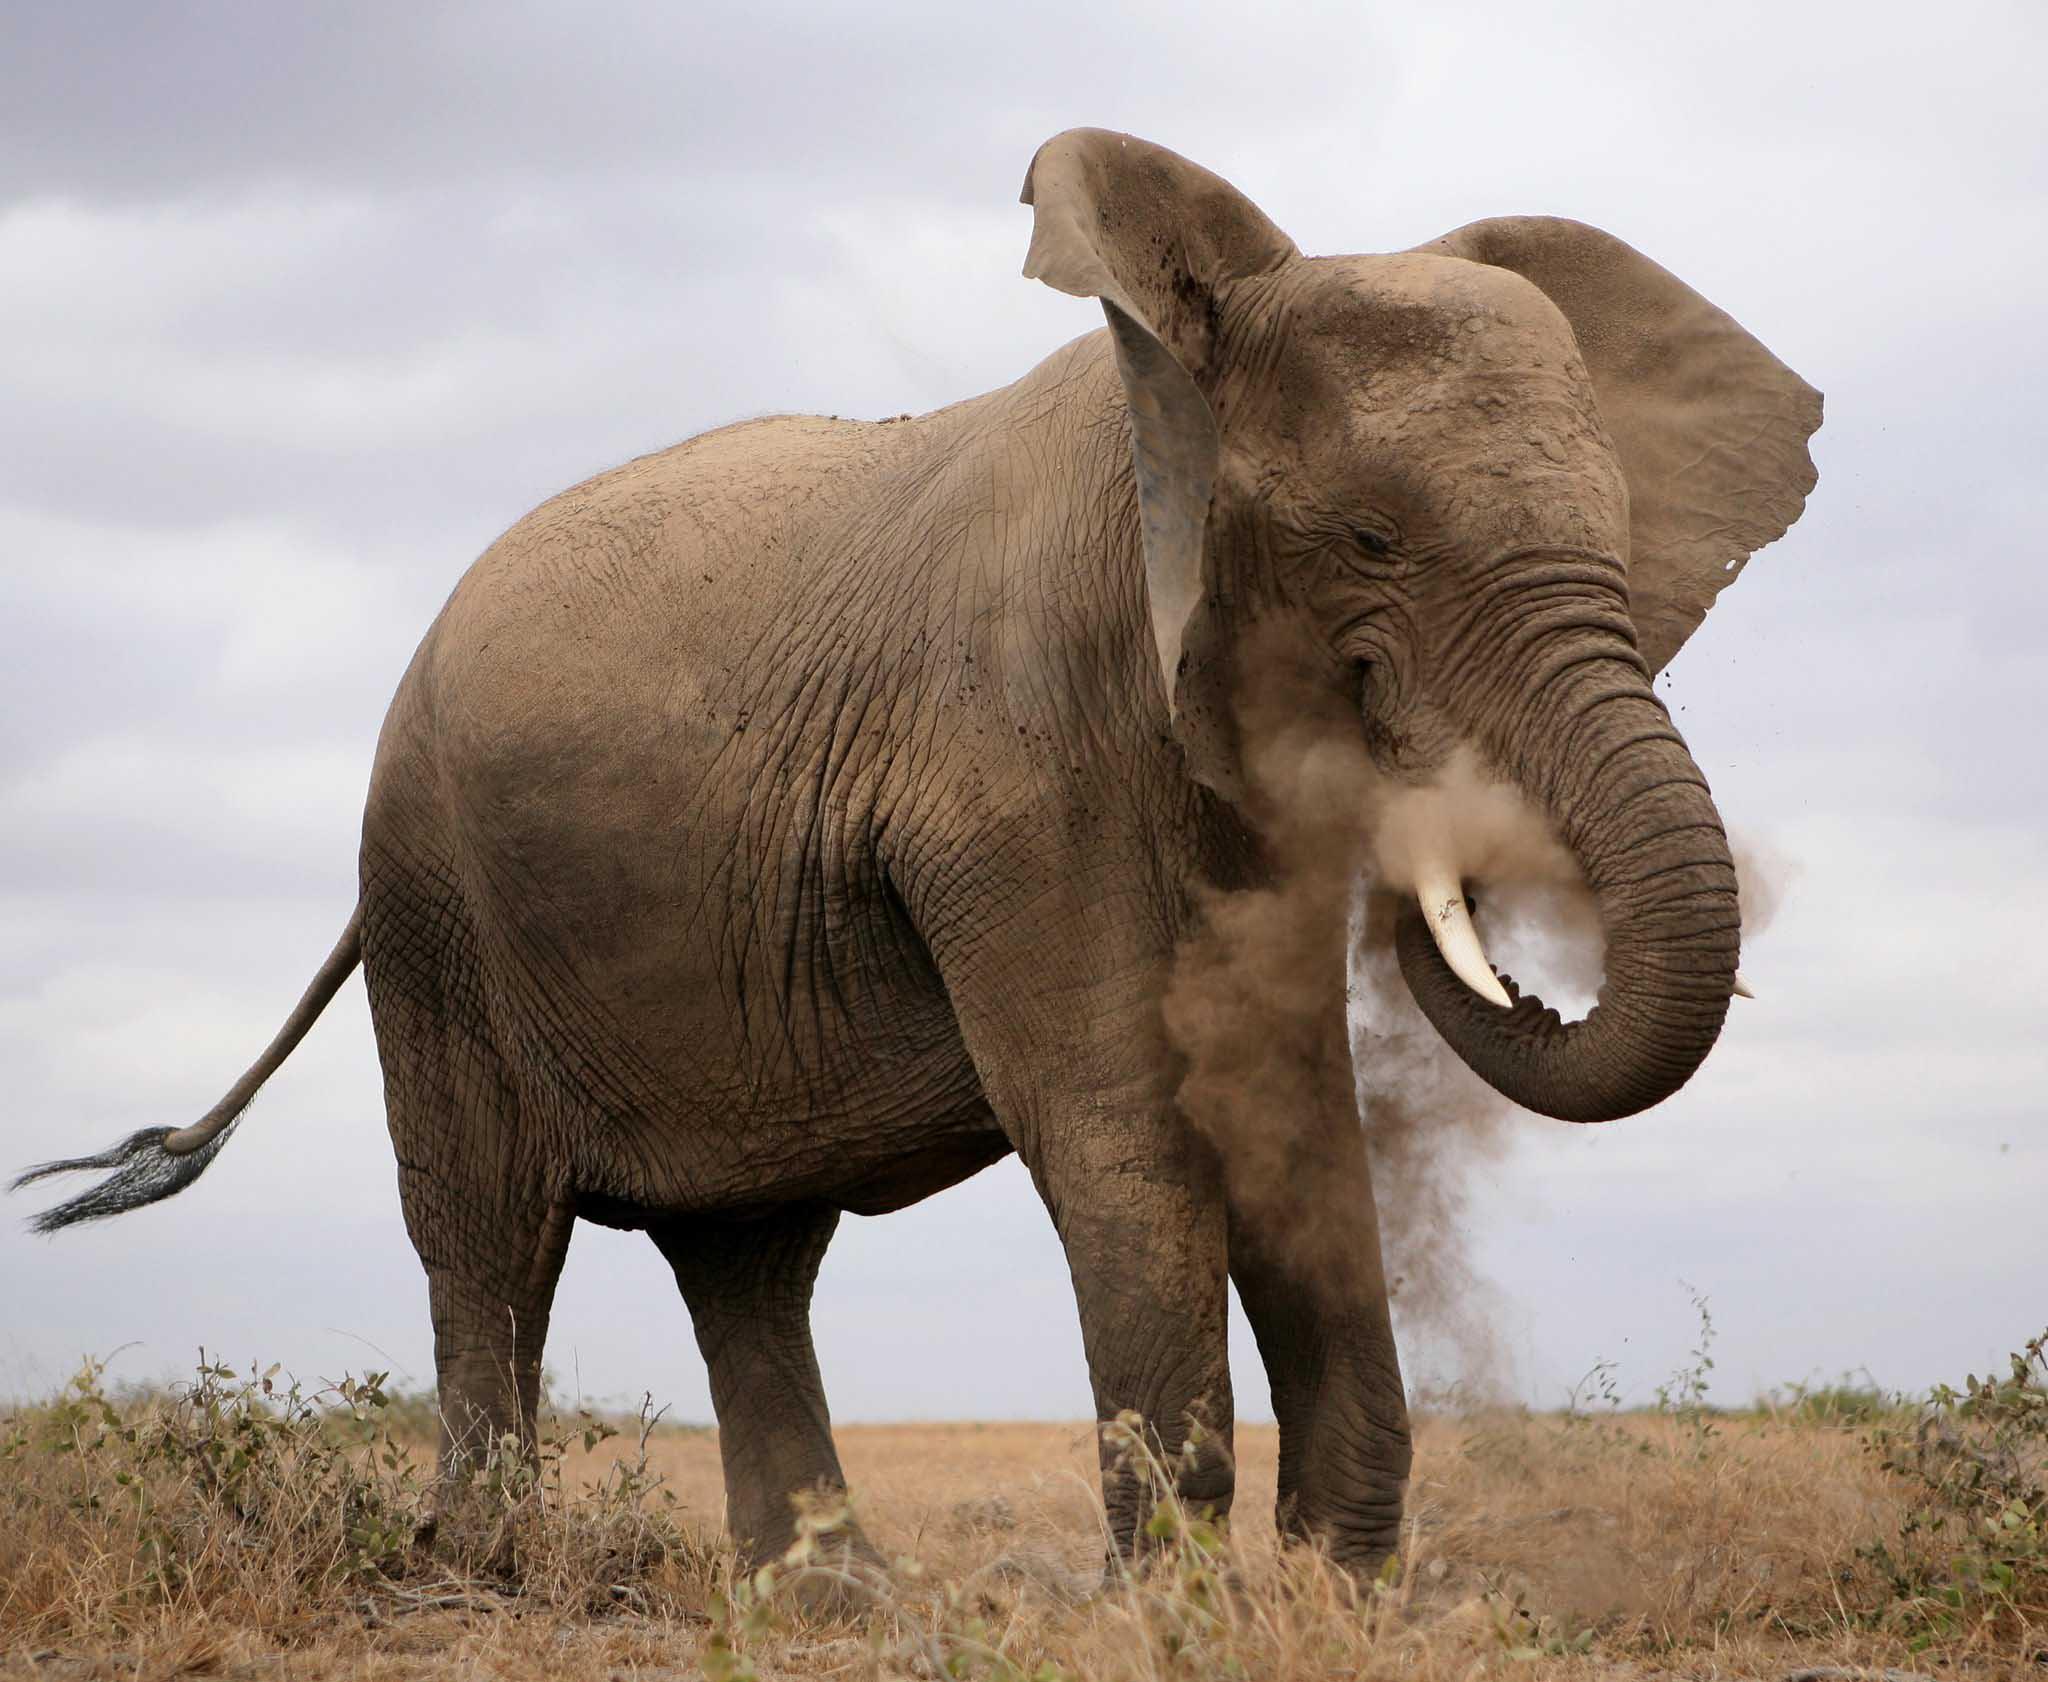 Safari en Ruaha Tanzania. Elefante